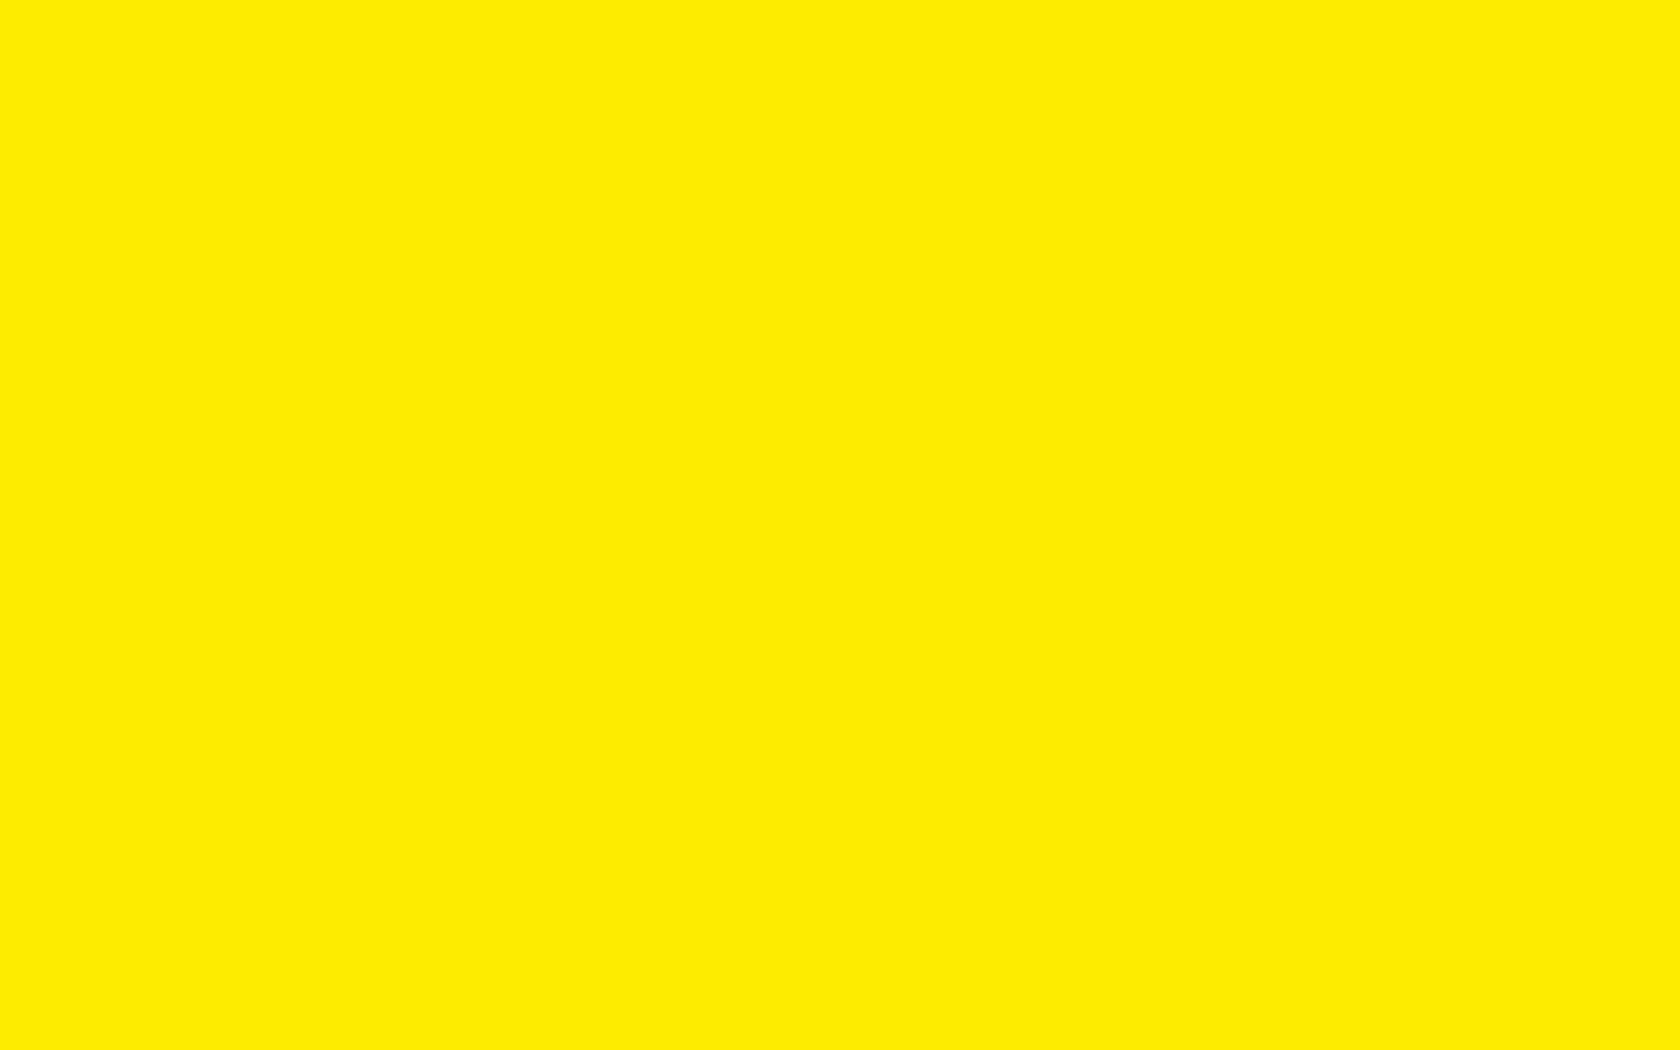 1680x1050 Aureolin Solid Color Background